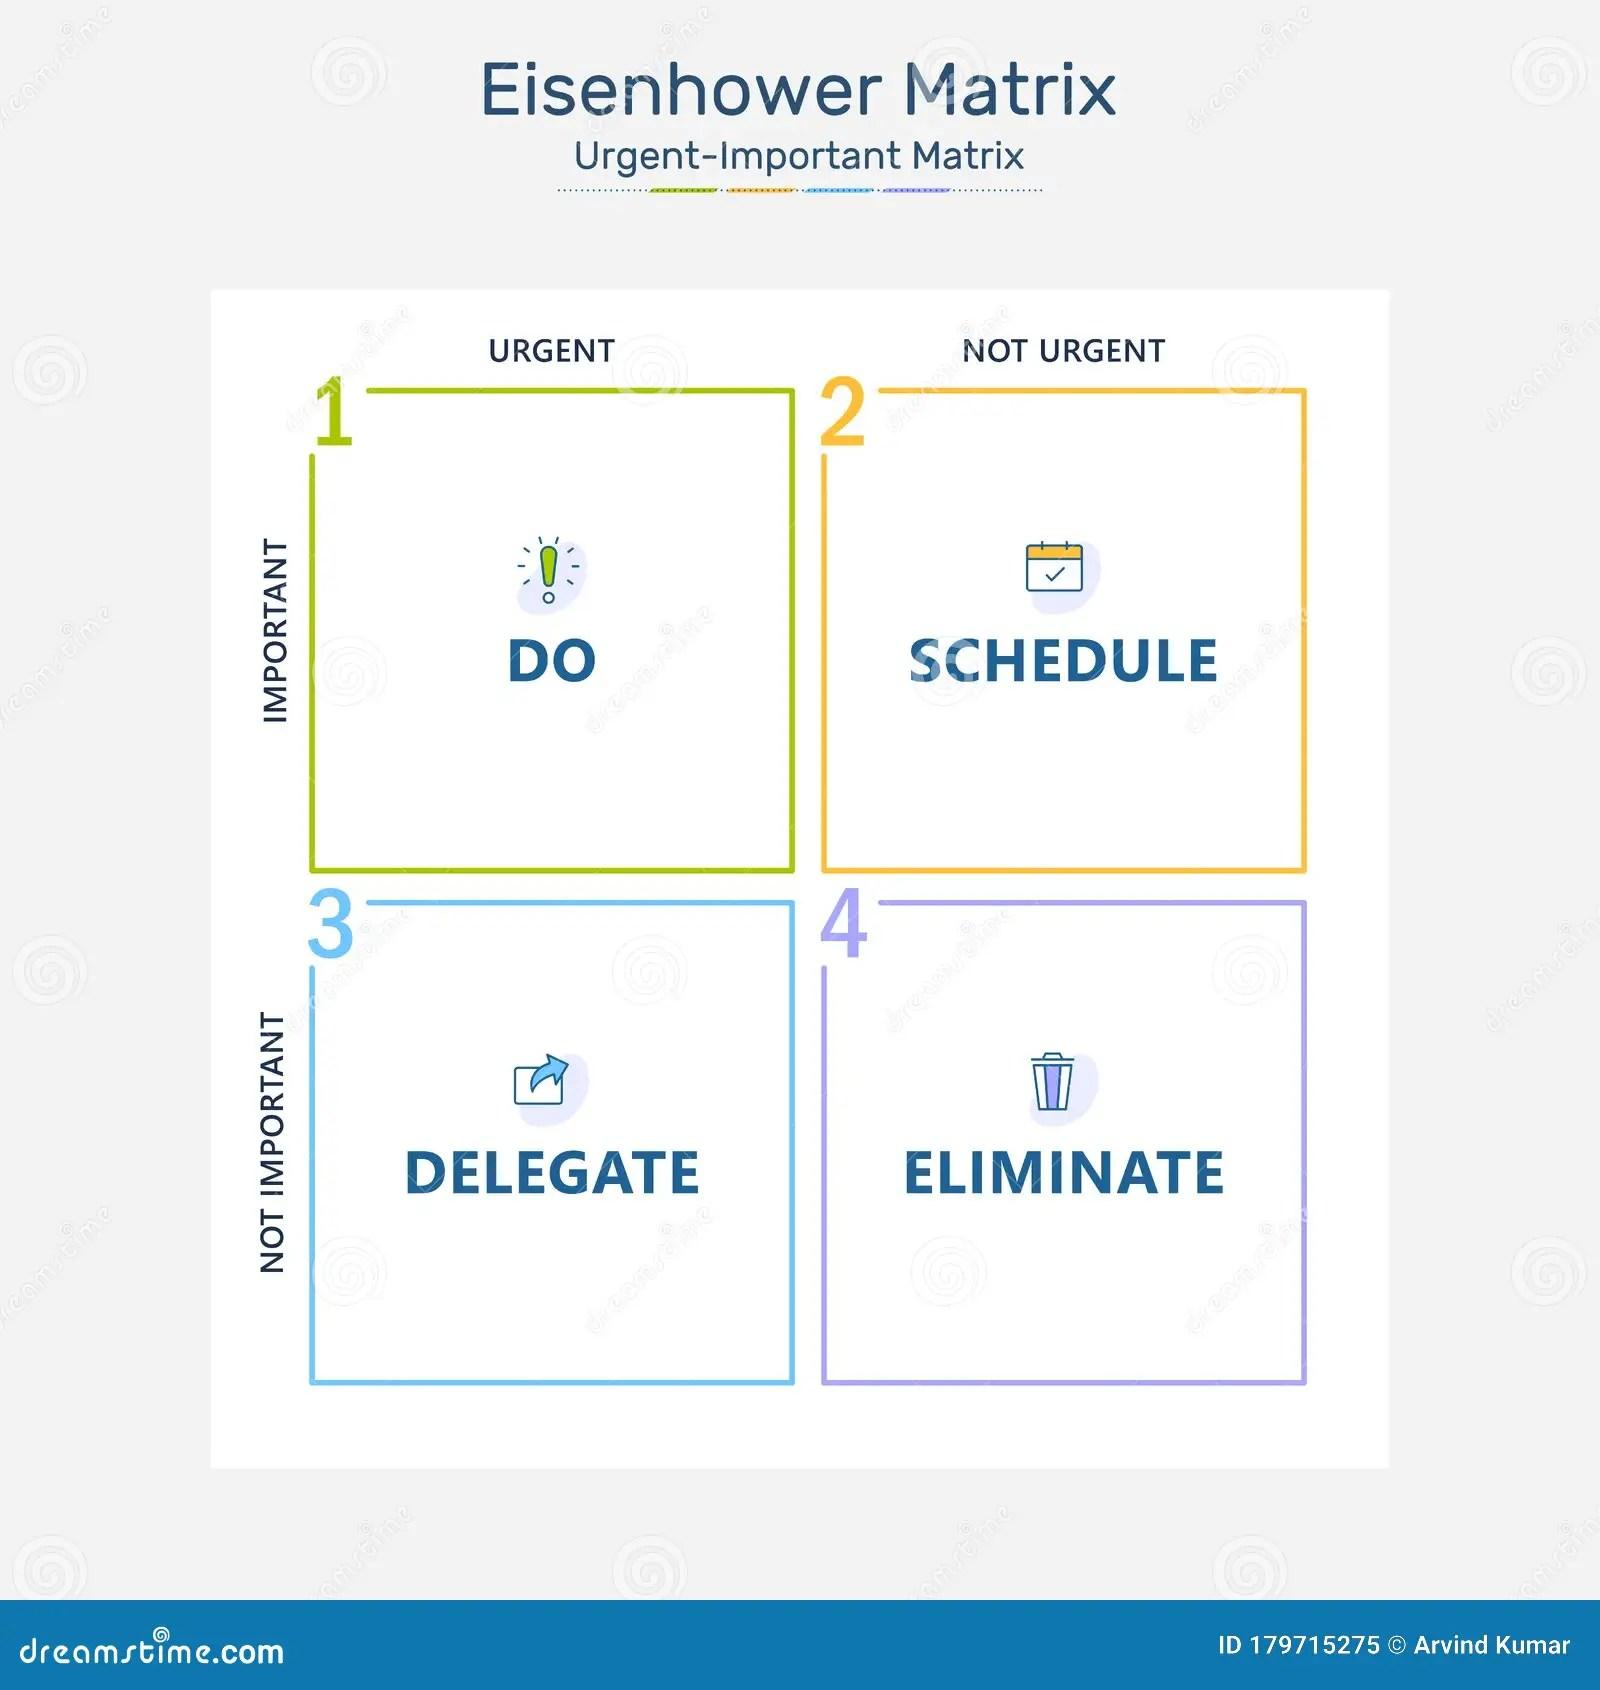 Eisenhower Matrix Urgent Important Matrix Prioritize